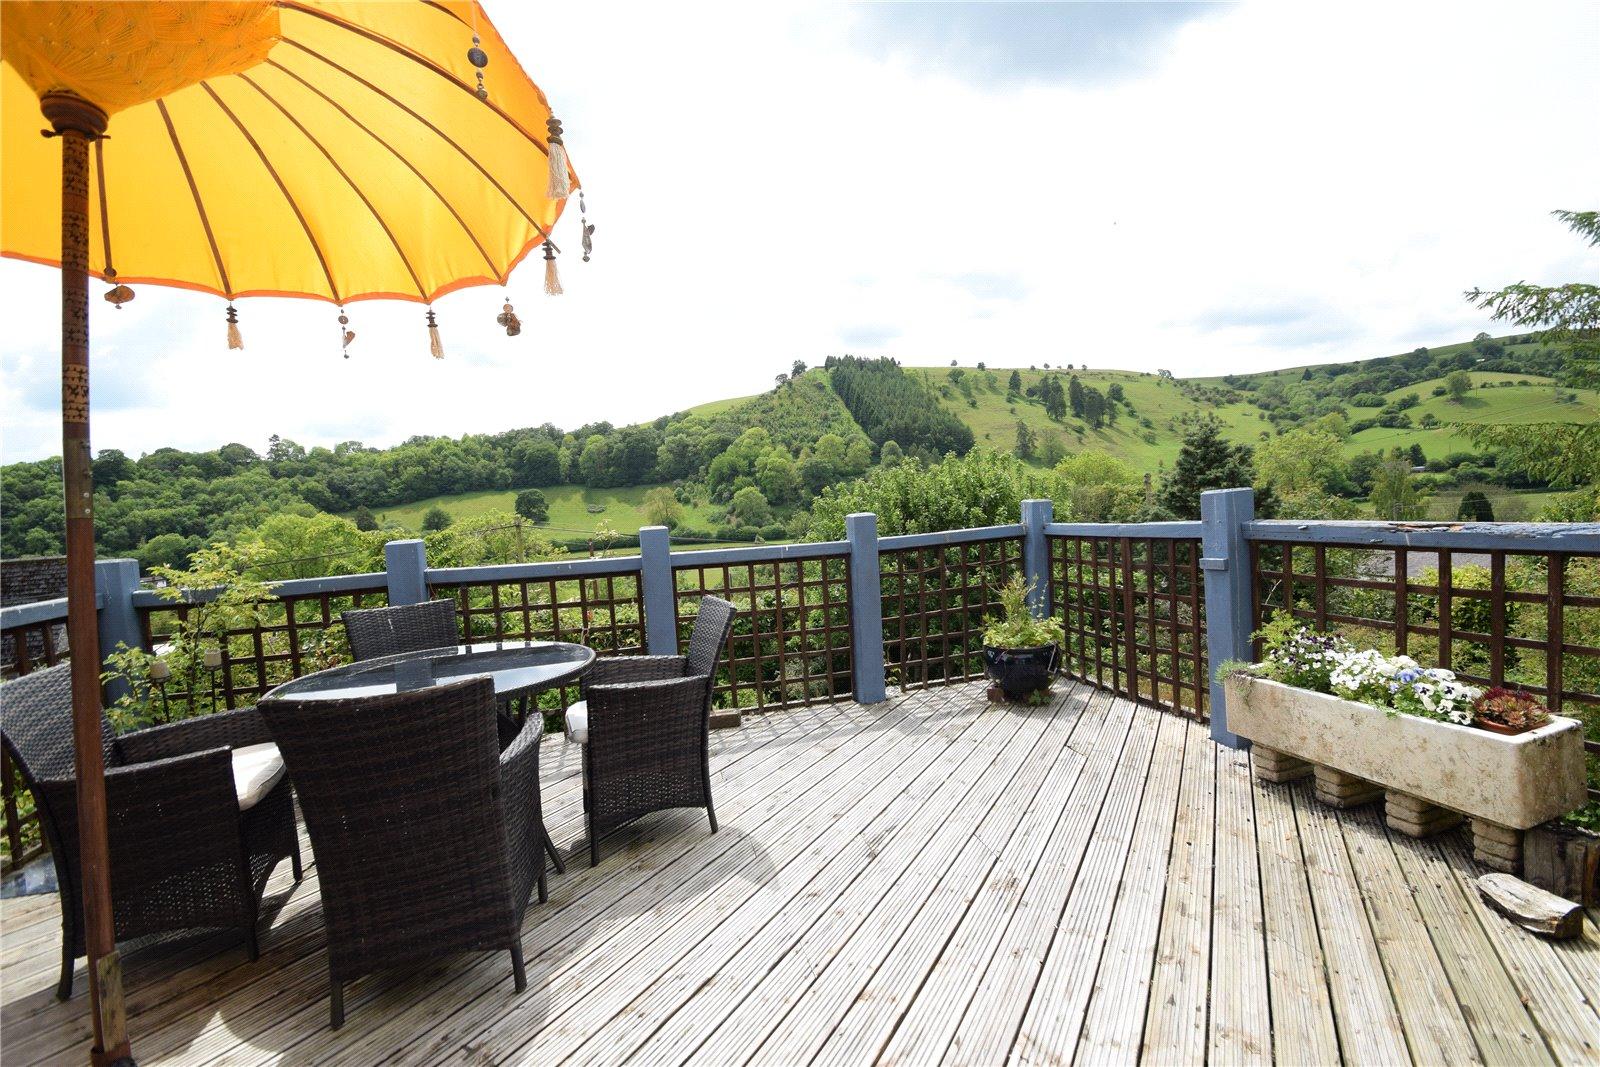 Ladycroft, Llanfairwaterdine, Knighton, Shropshire, LD7